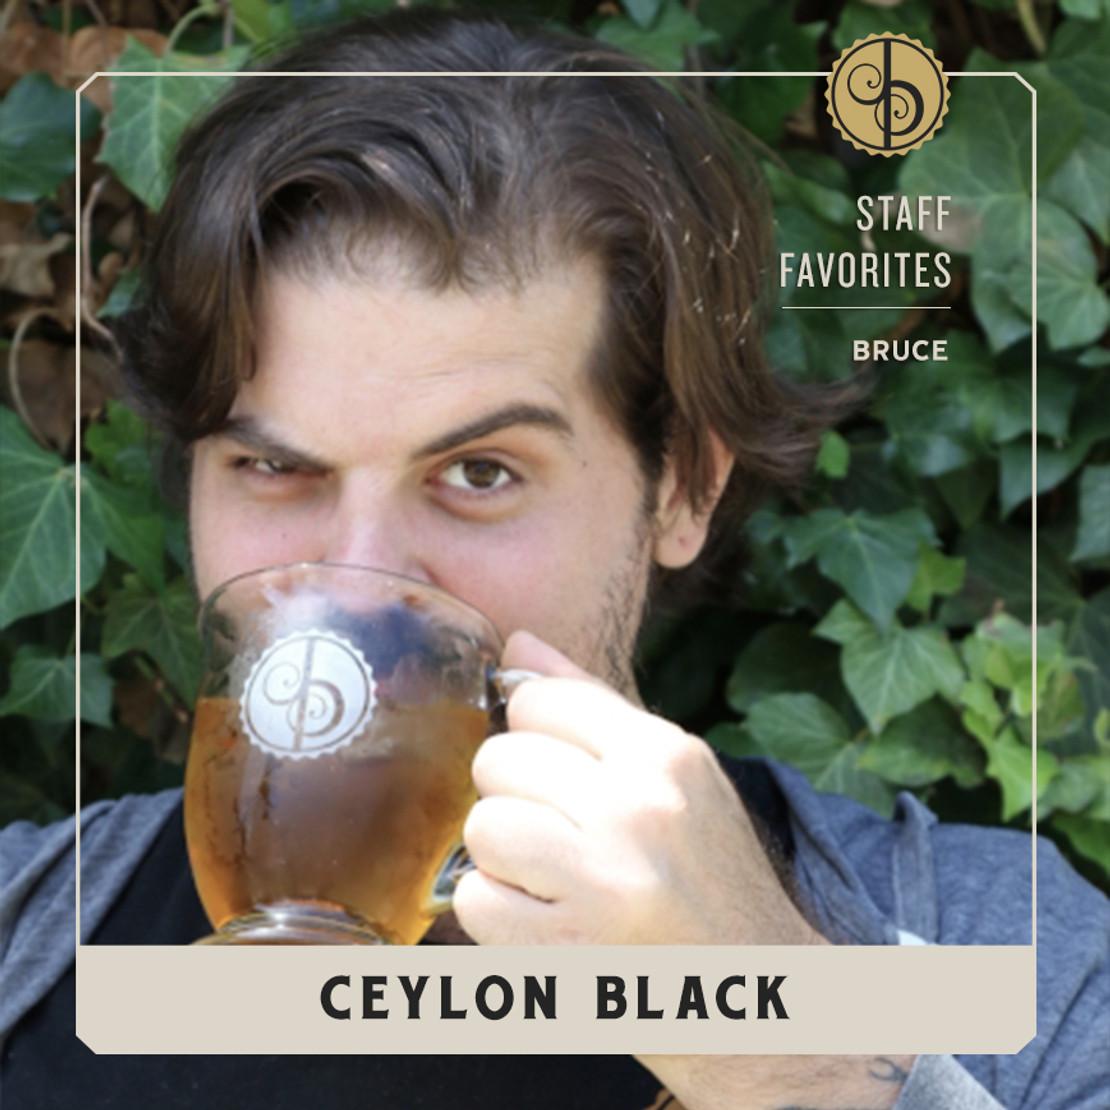 Staff Favorites: Bruce & Ceylon